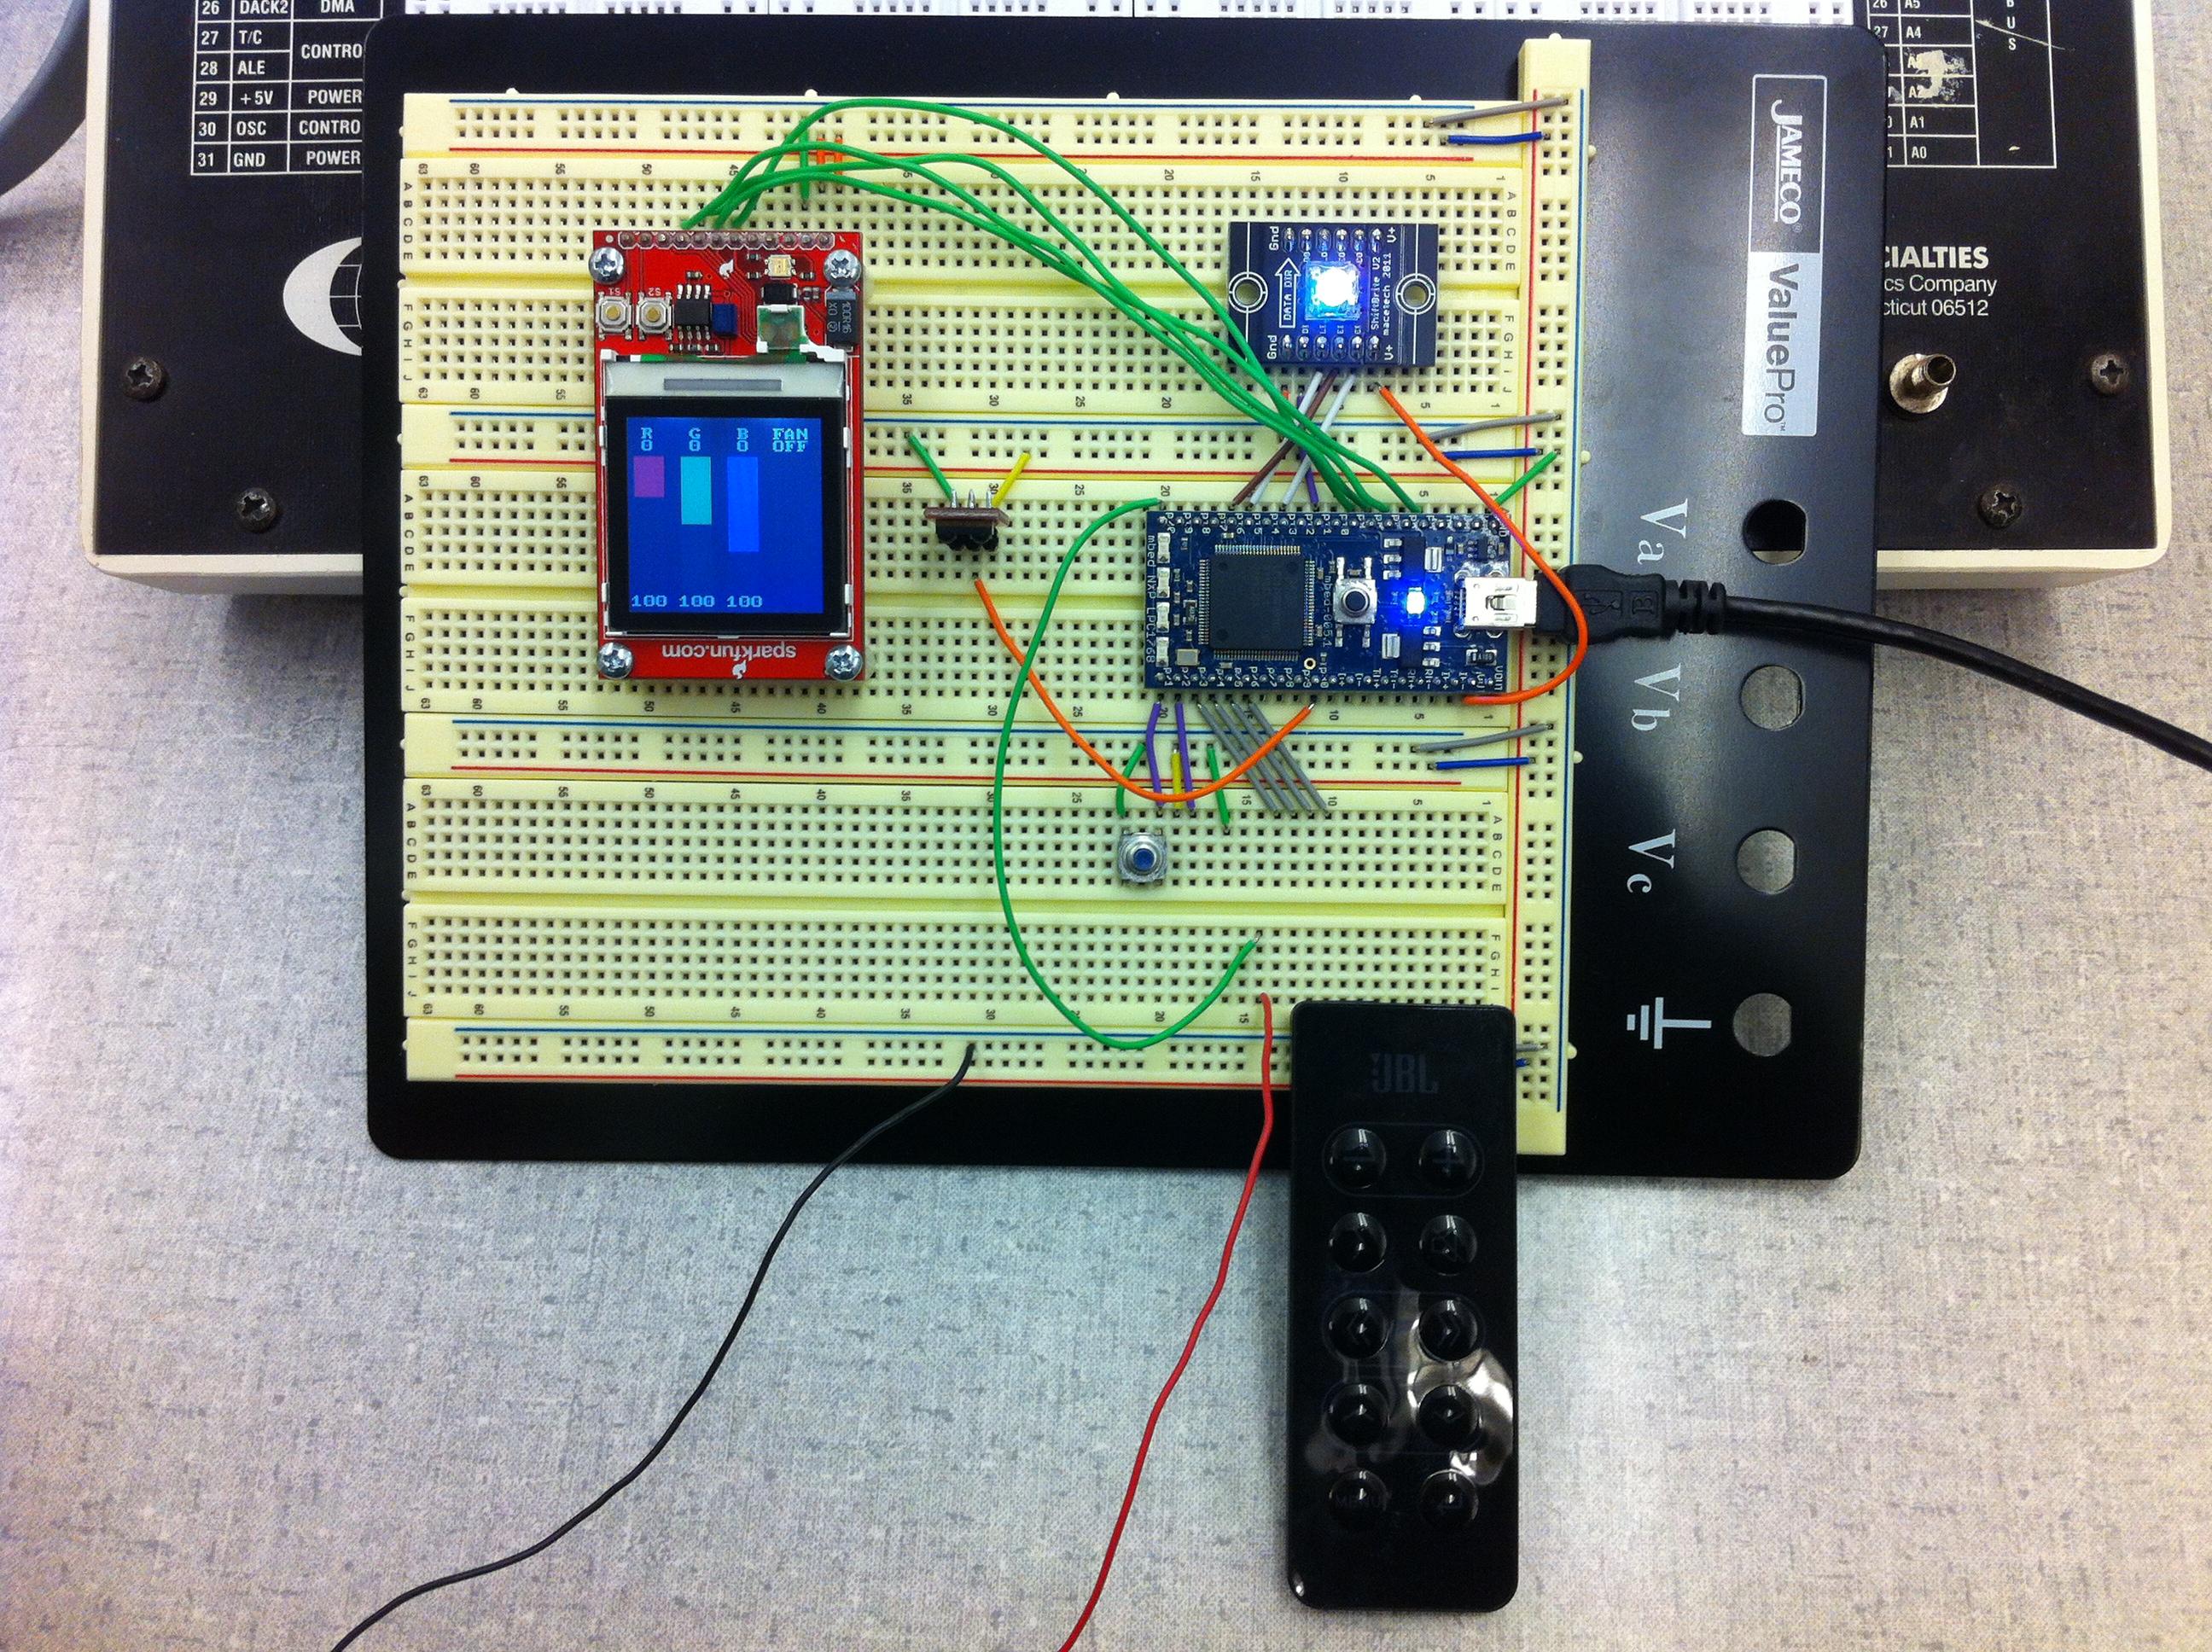 Ir Remote Control Mbed Infraredtransmittercircuitlabeledonbreadboardjpg Media Uploads Vin Jm Img 0441